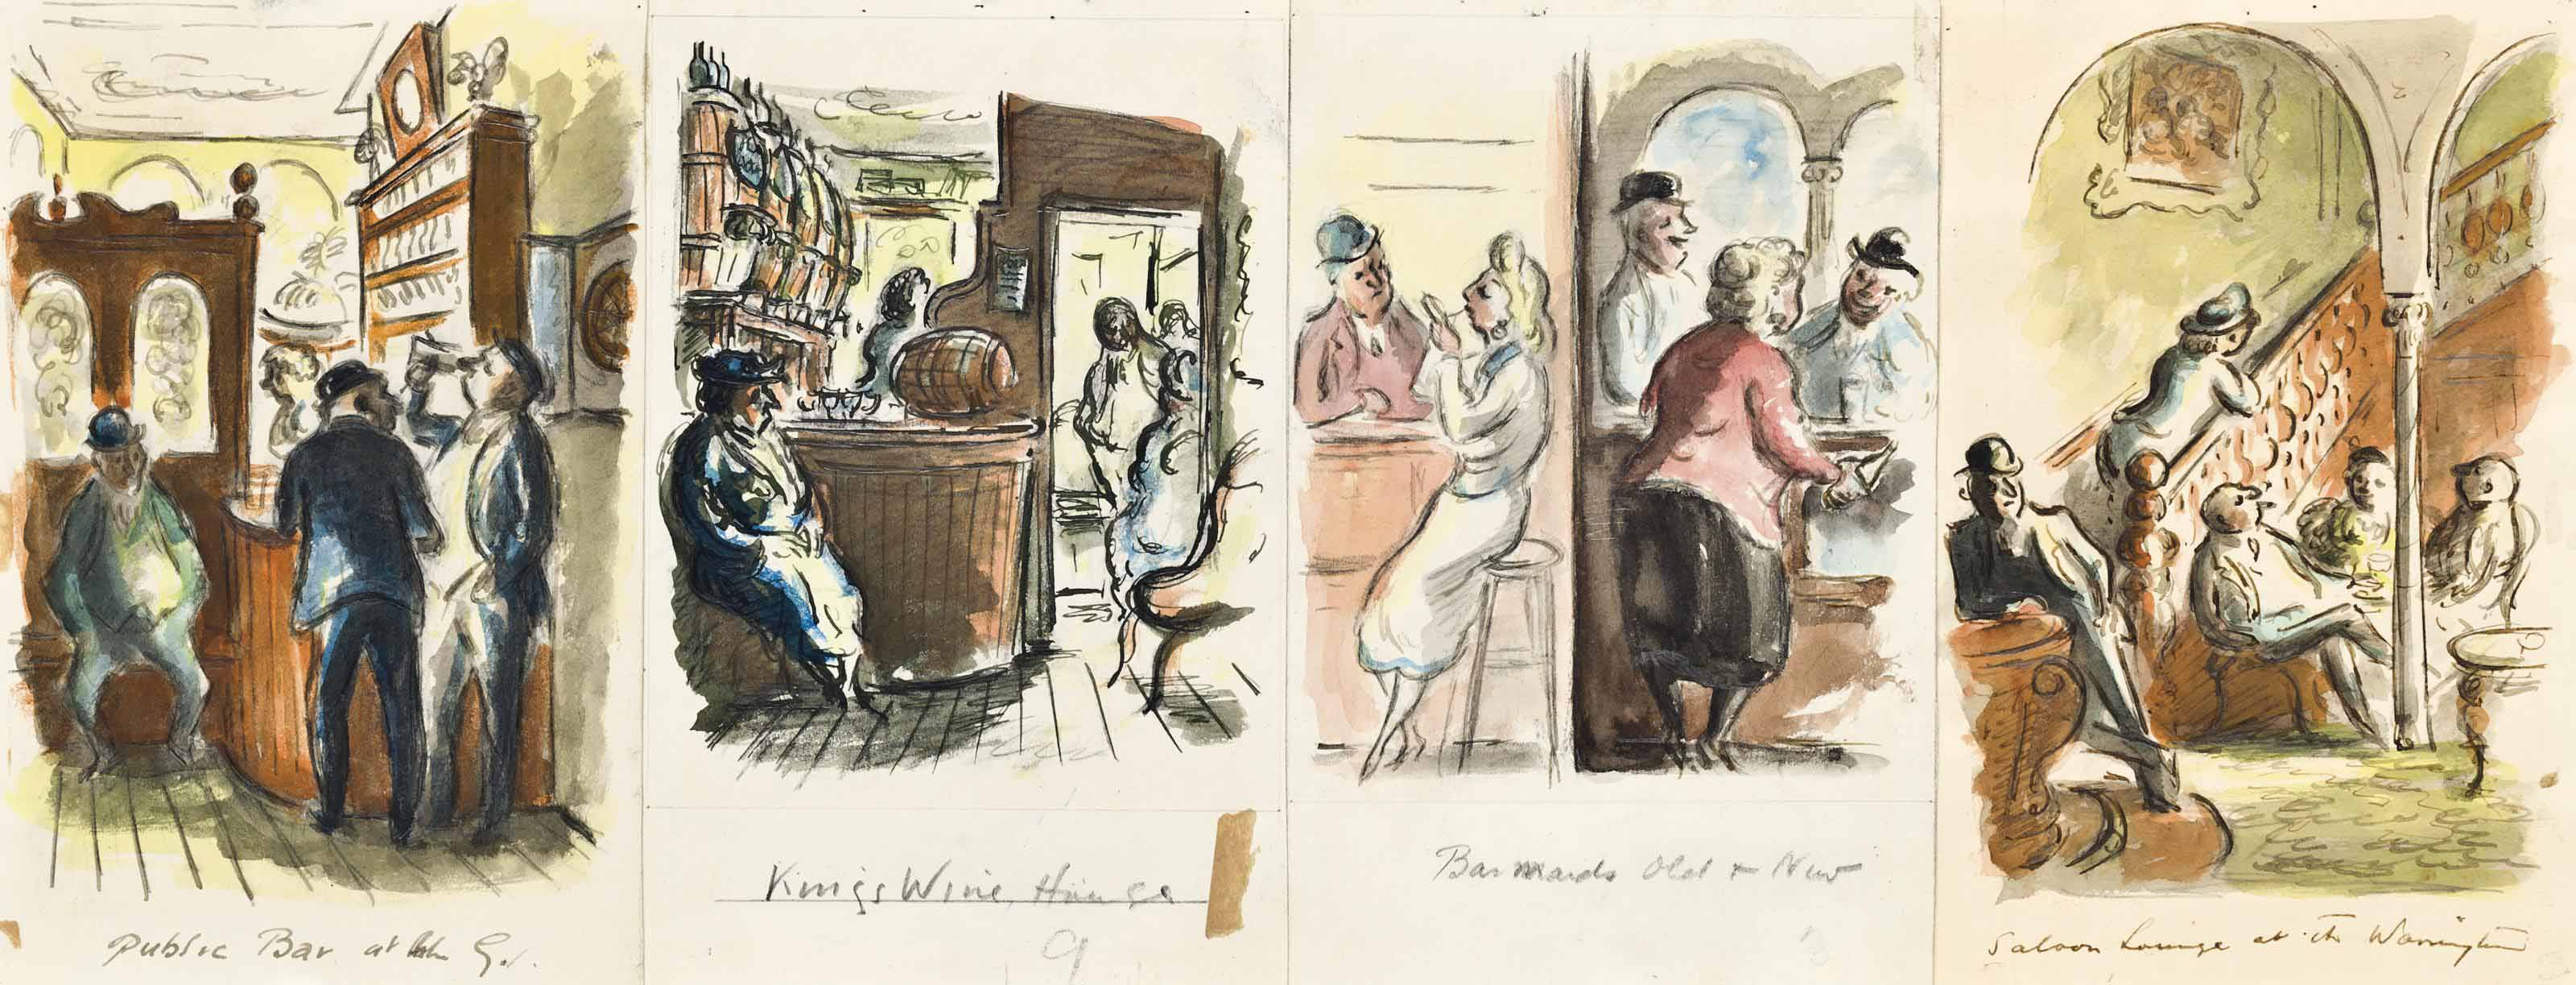 Four illustrations of pub interiors (all illustrated)